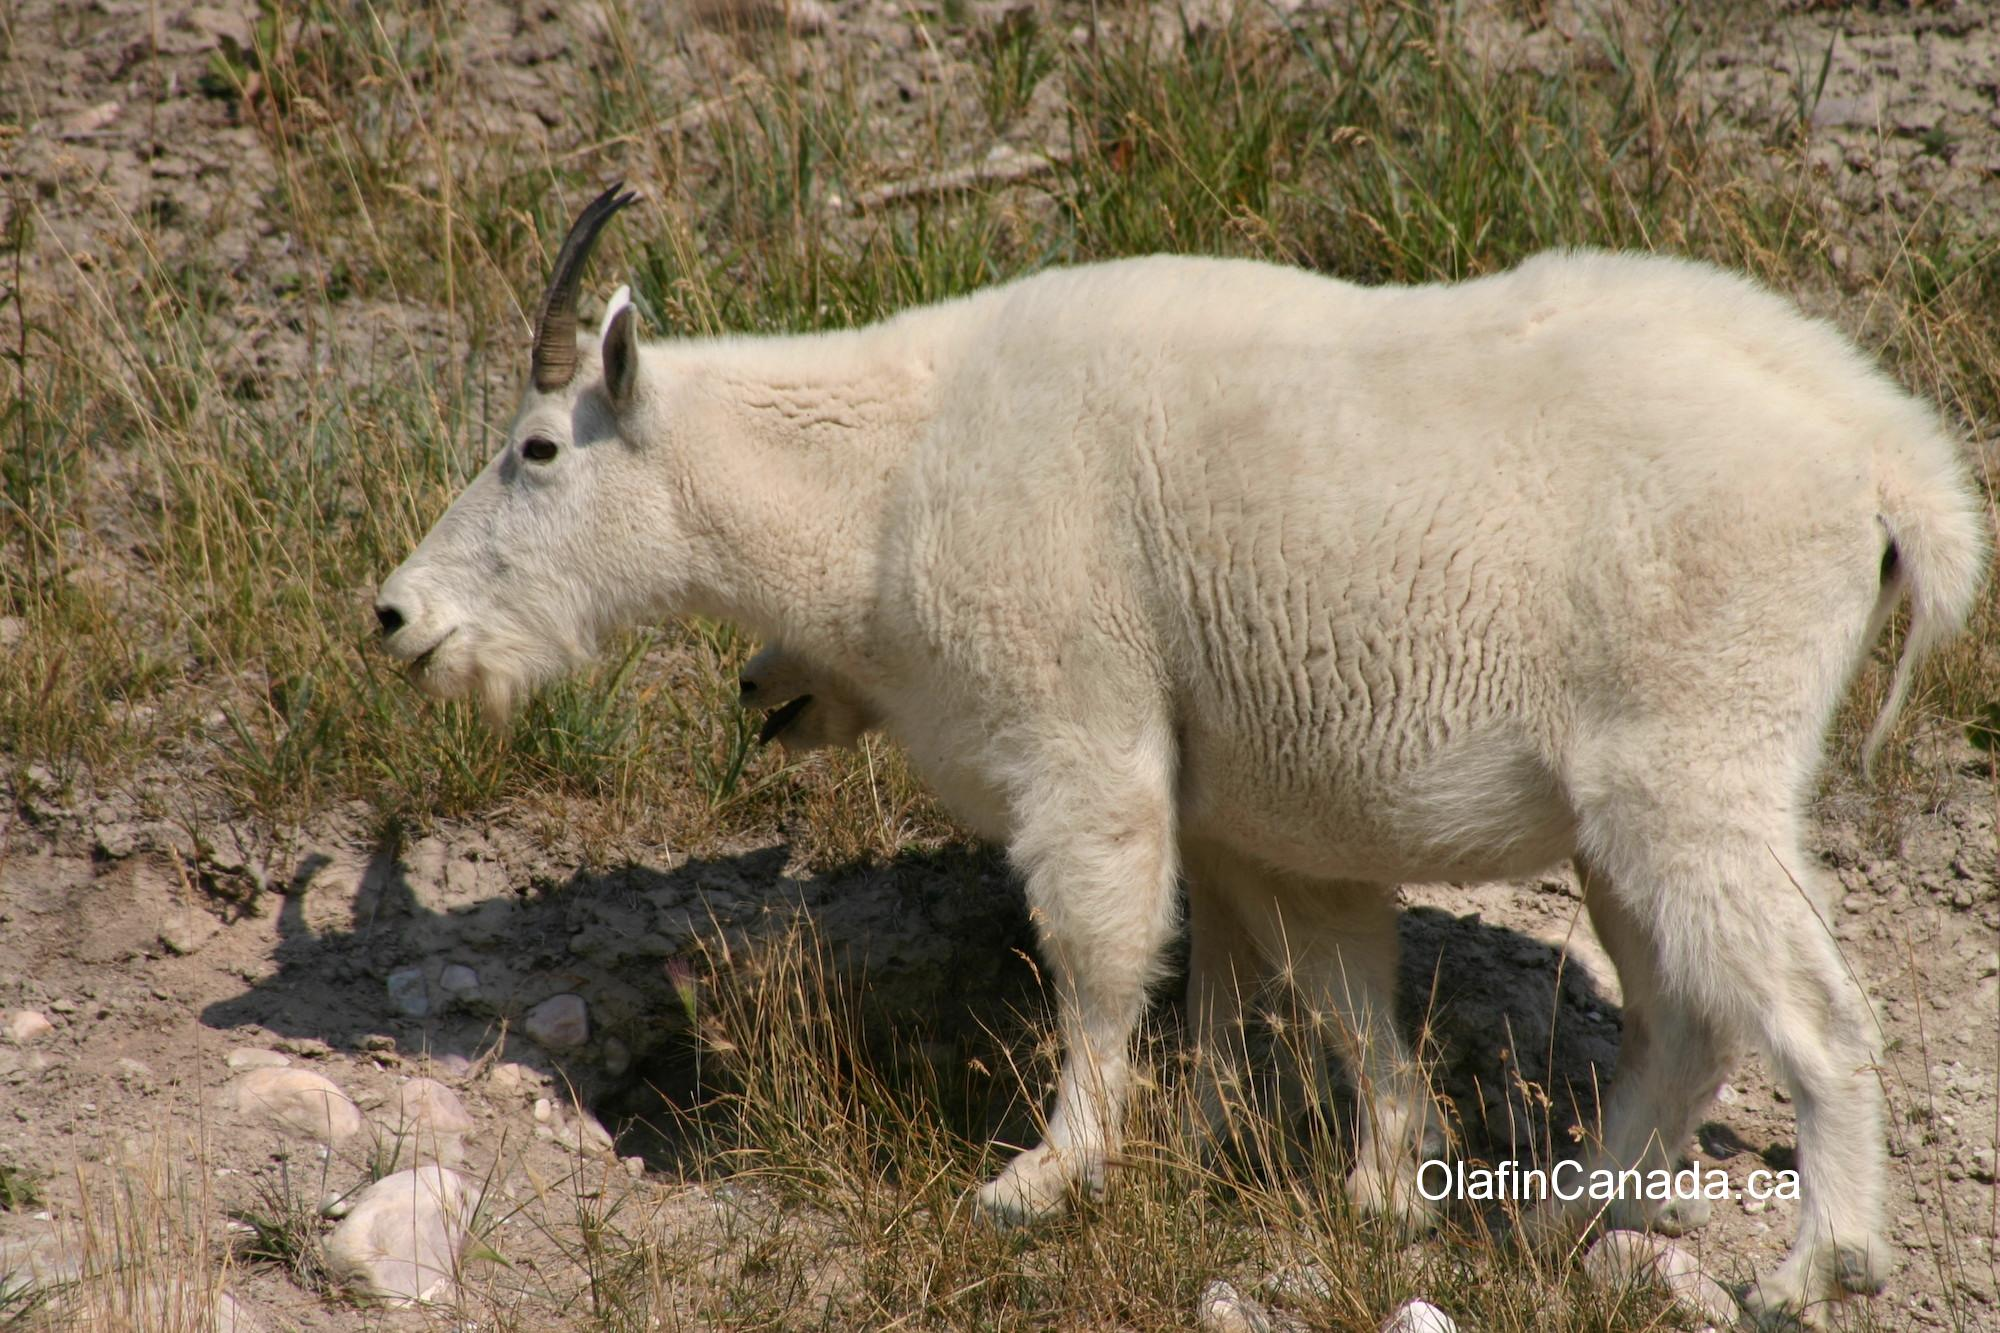 Mountain goat with cub hiding, taken in the Rockies #olafincanada #alberta #rockies #wildlife #mountaingoat